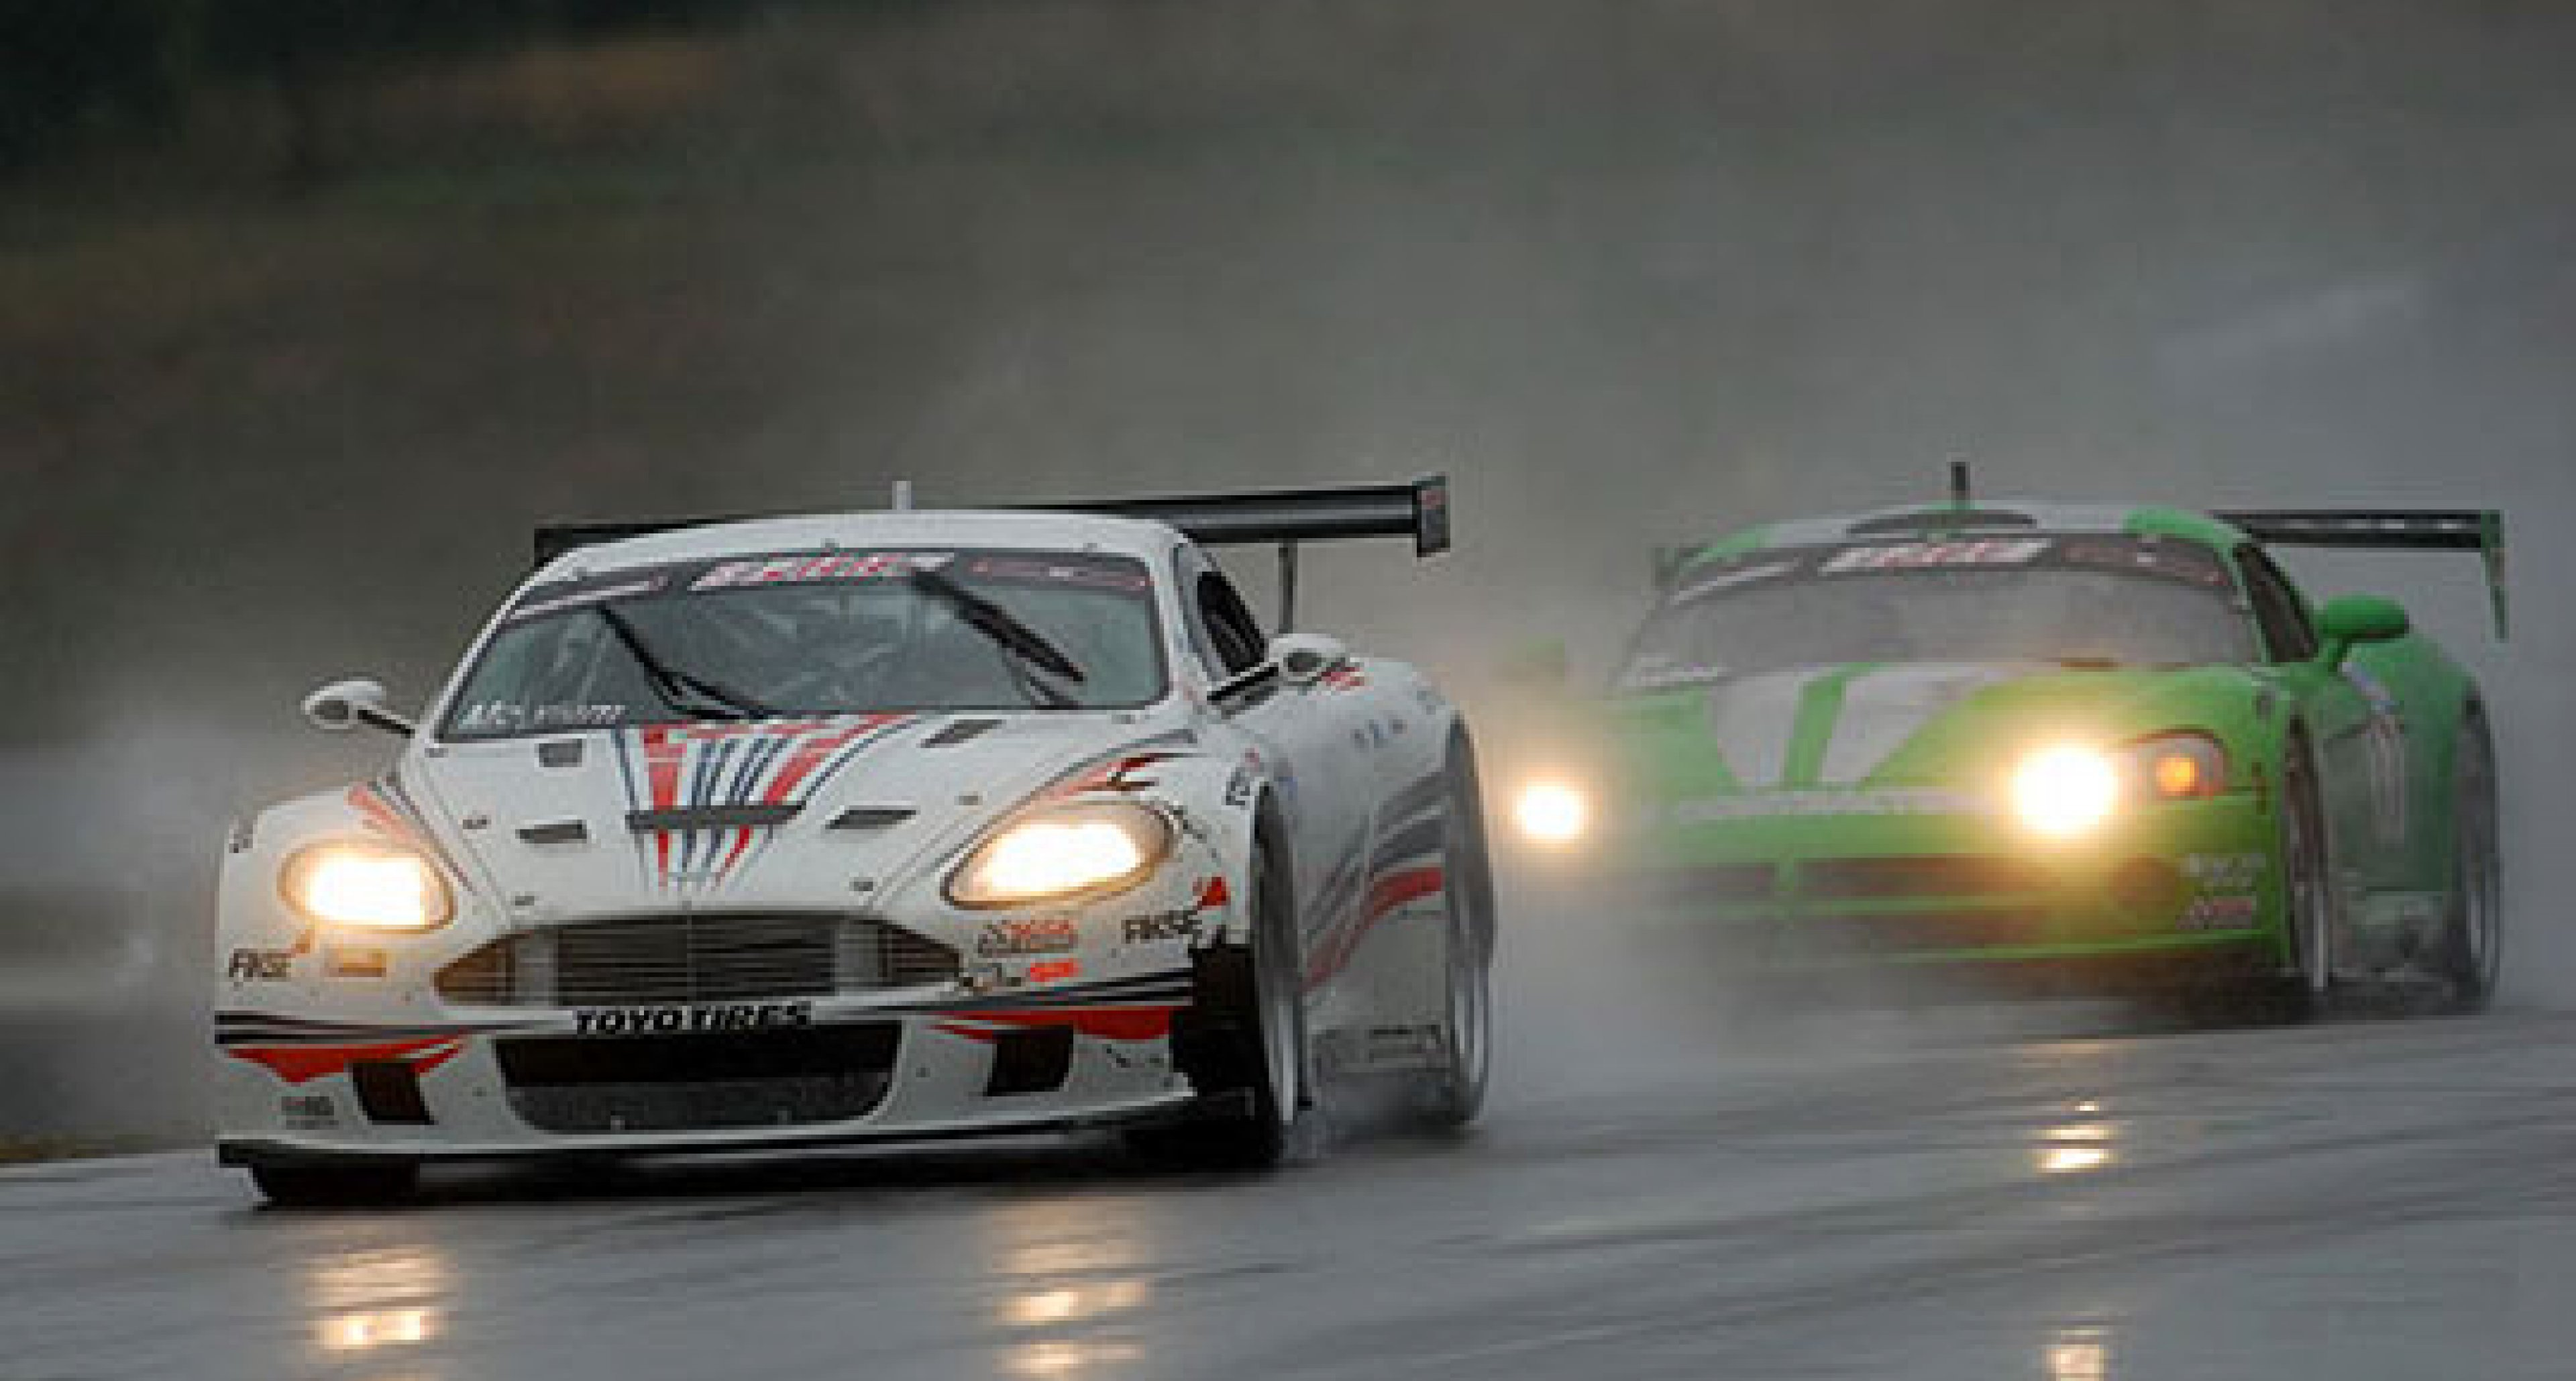 Autosport Designs Aston Martin DBRS9s at Mosport 2006